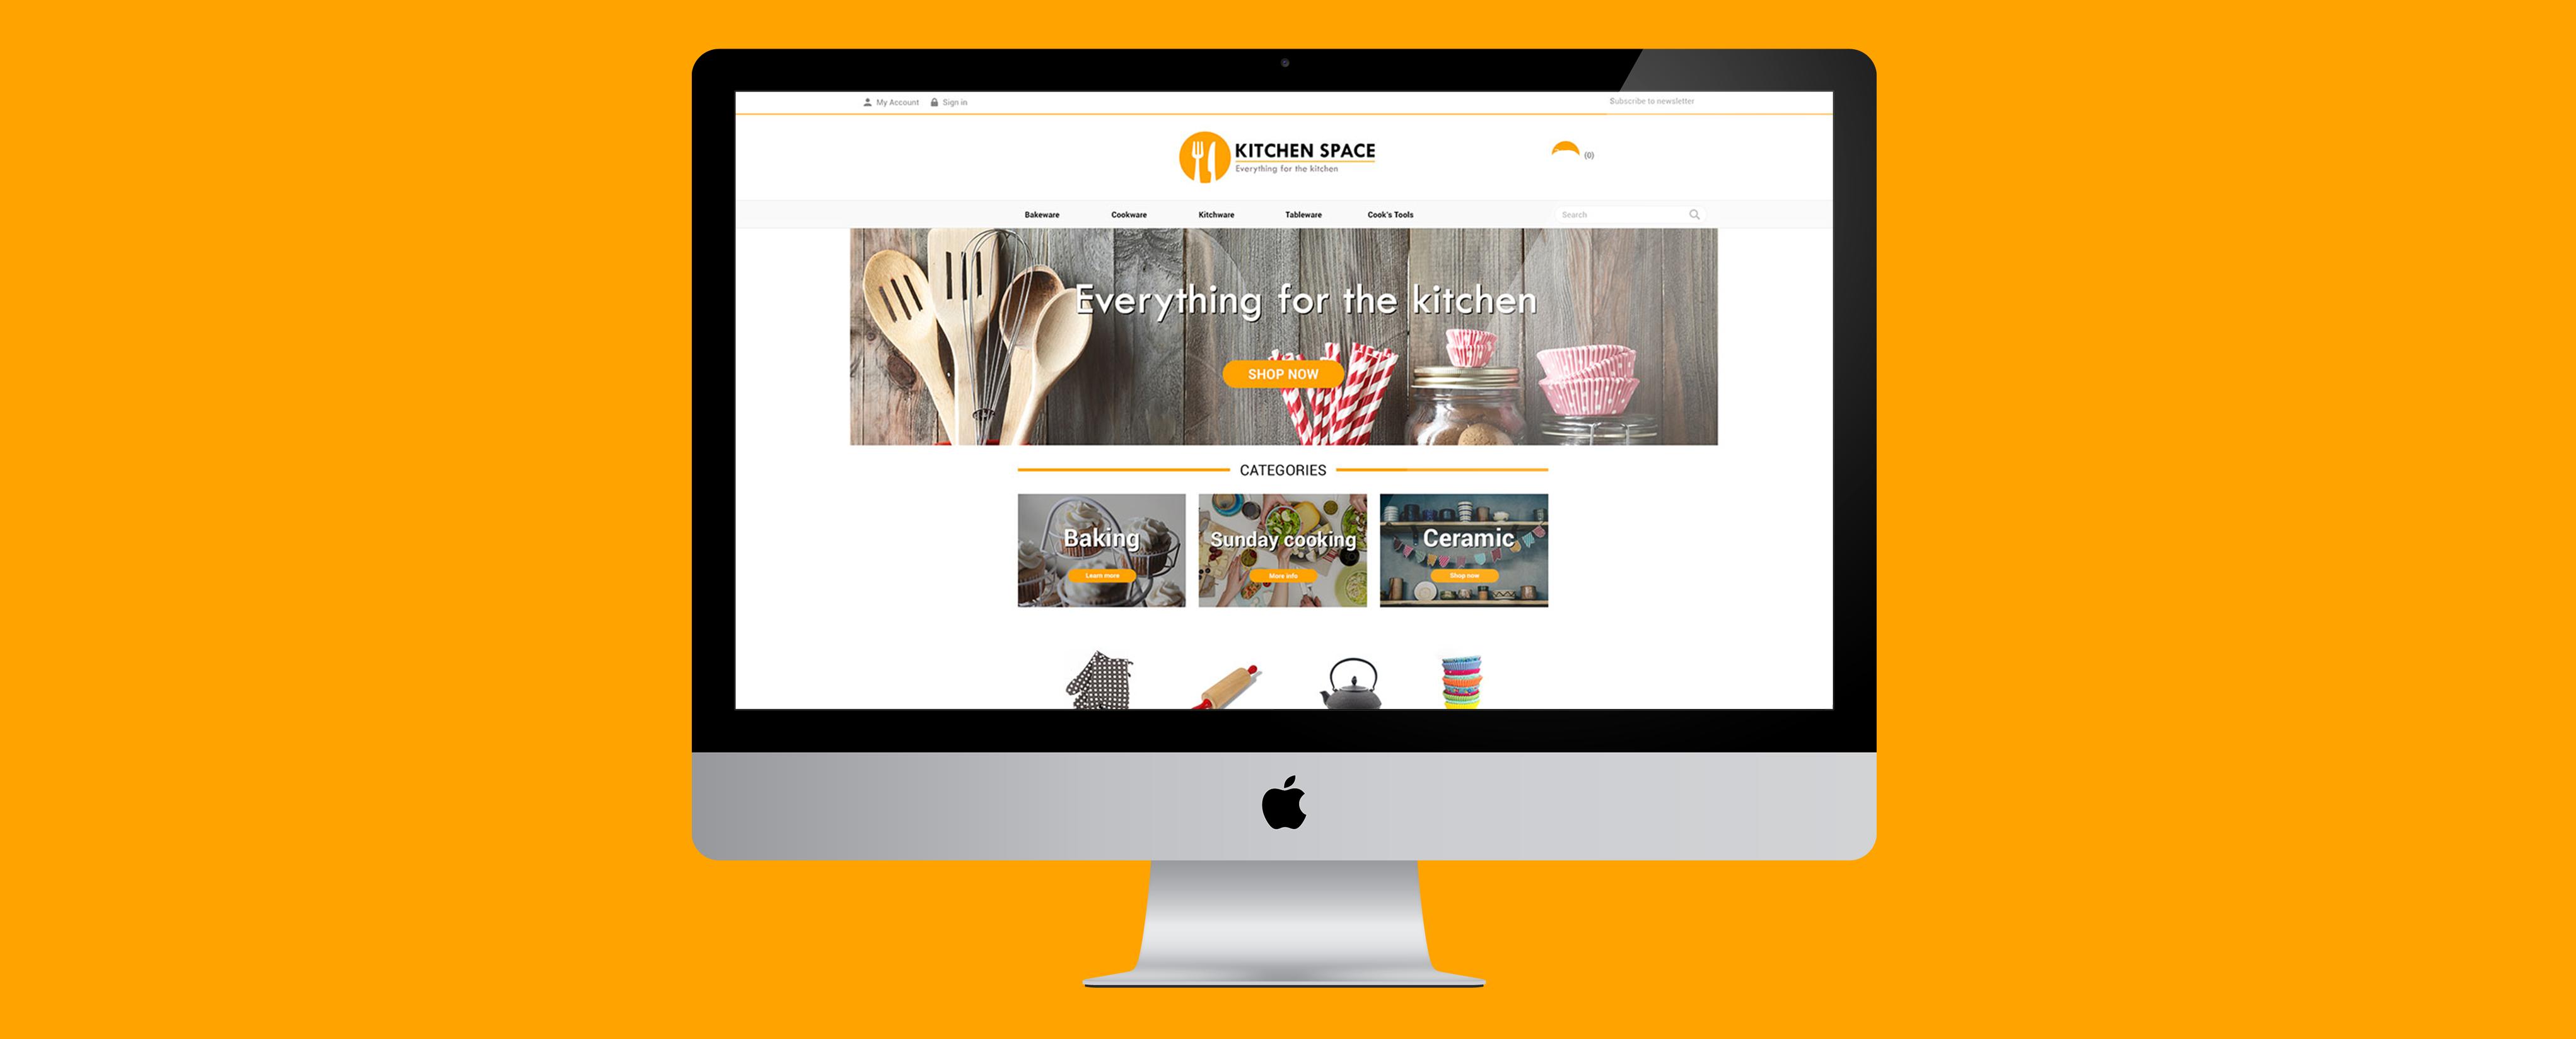 Kitchen Space Demo Shop ePages